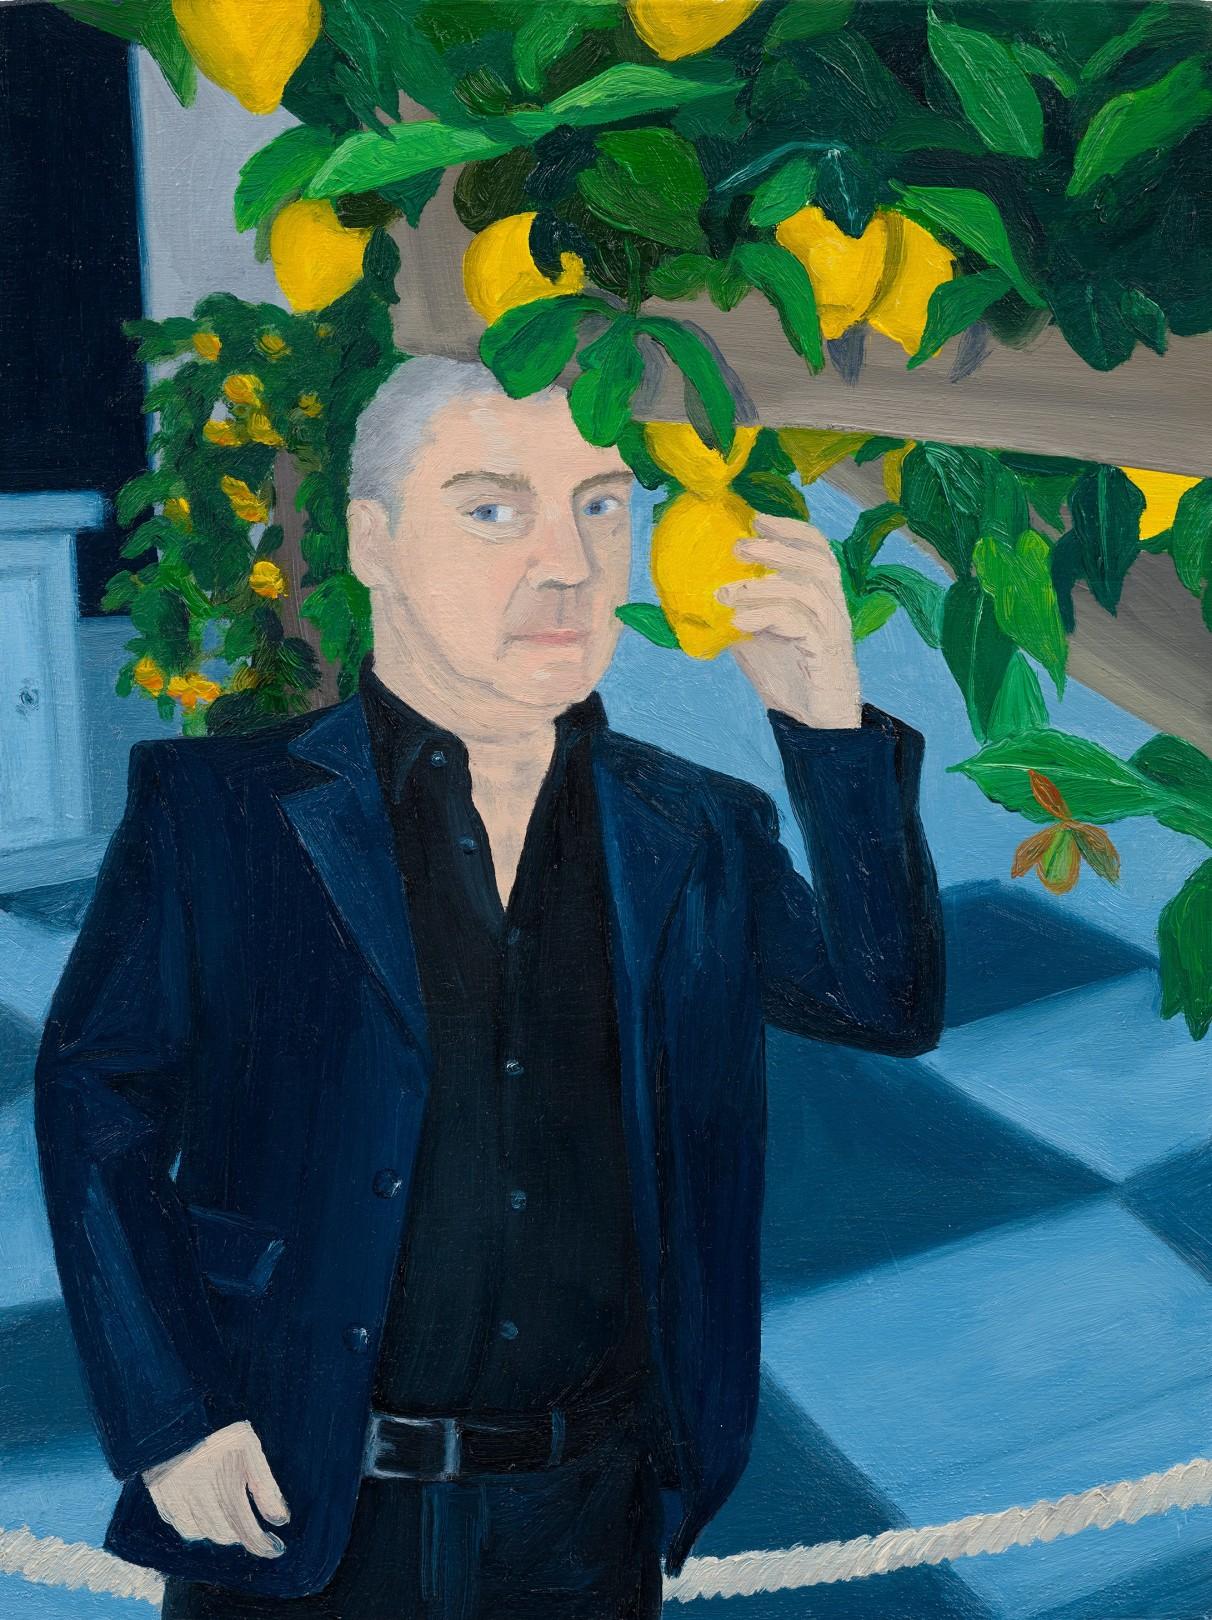 Damien Hirst with Lemon Tree, Venice, 2021 Oil on panel 20.5 x 15.5 cm. / 8 x 6 in.